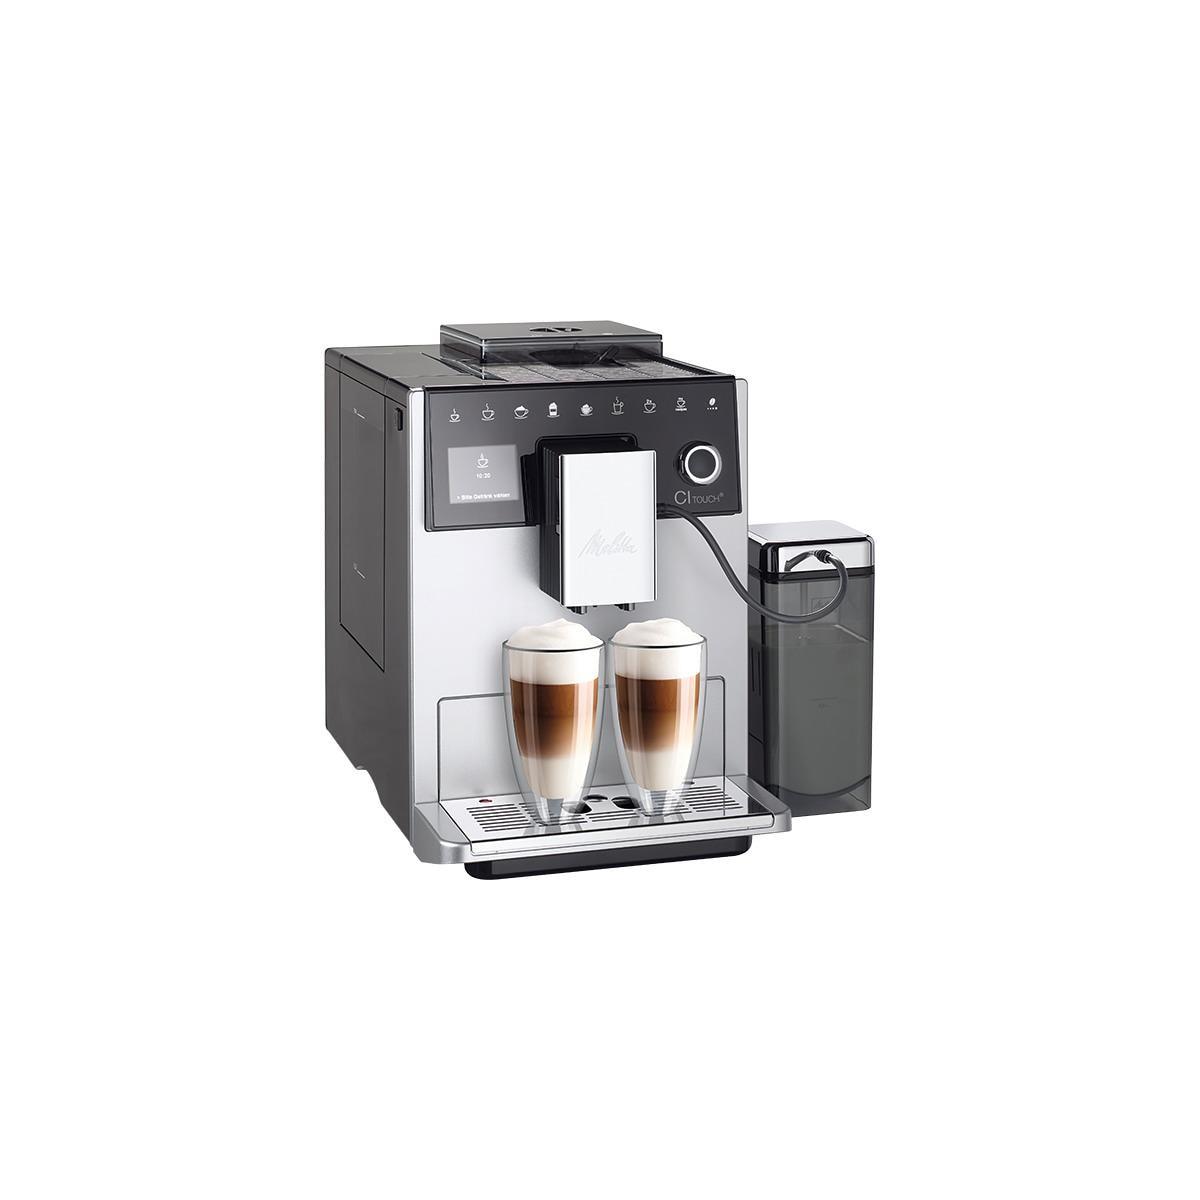 melitta caffeo ci e970 101ci 15 bar kaffeevollautomat one touch silber milchbeh lter von. Black Bedroom Furniture Sets. Home Design Ideas